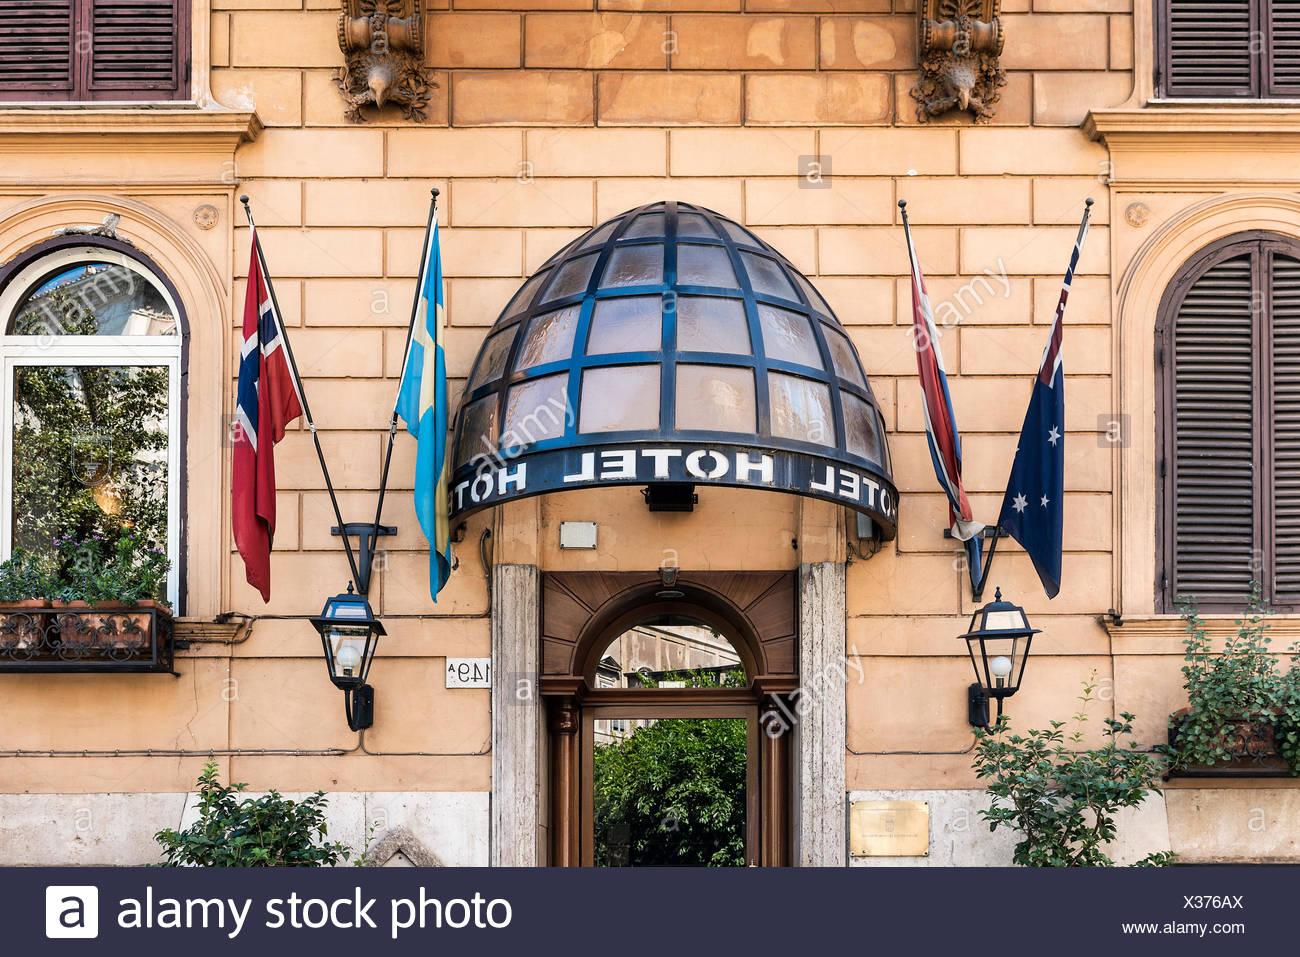 Hotel Quattro Fontane, Rome, Italy Stock Photo